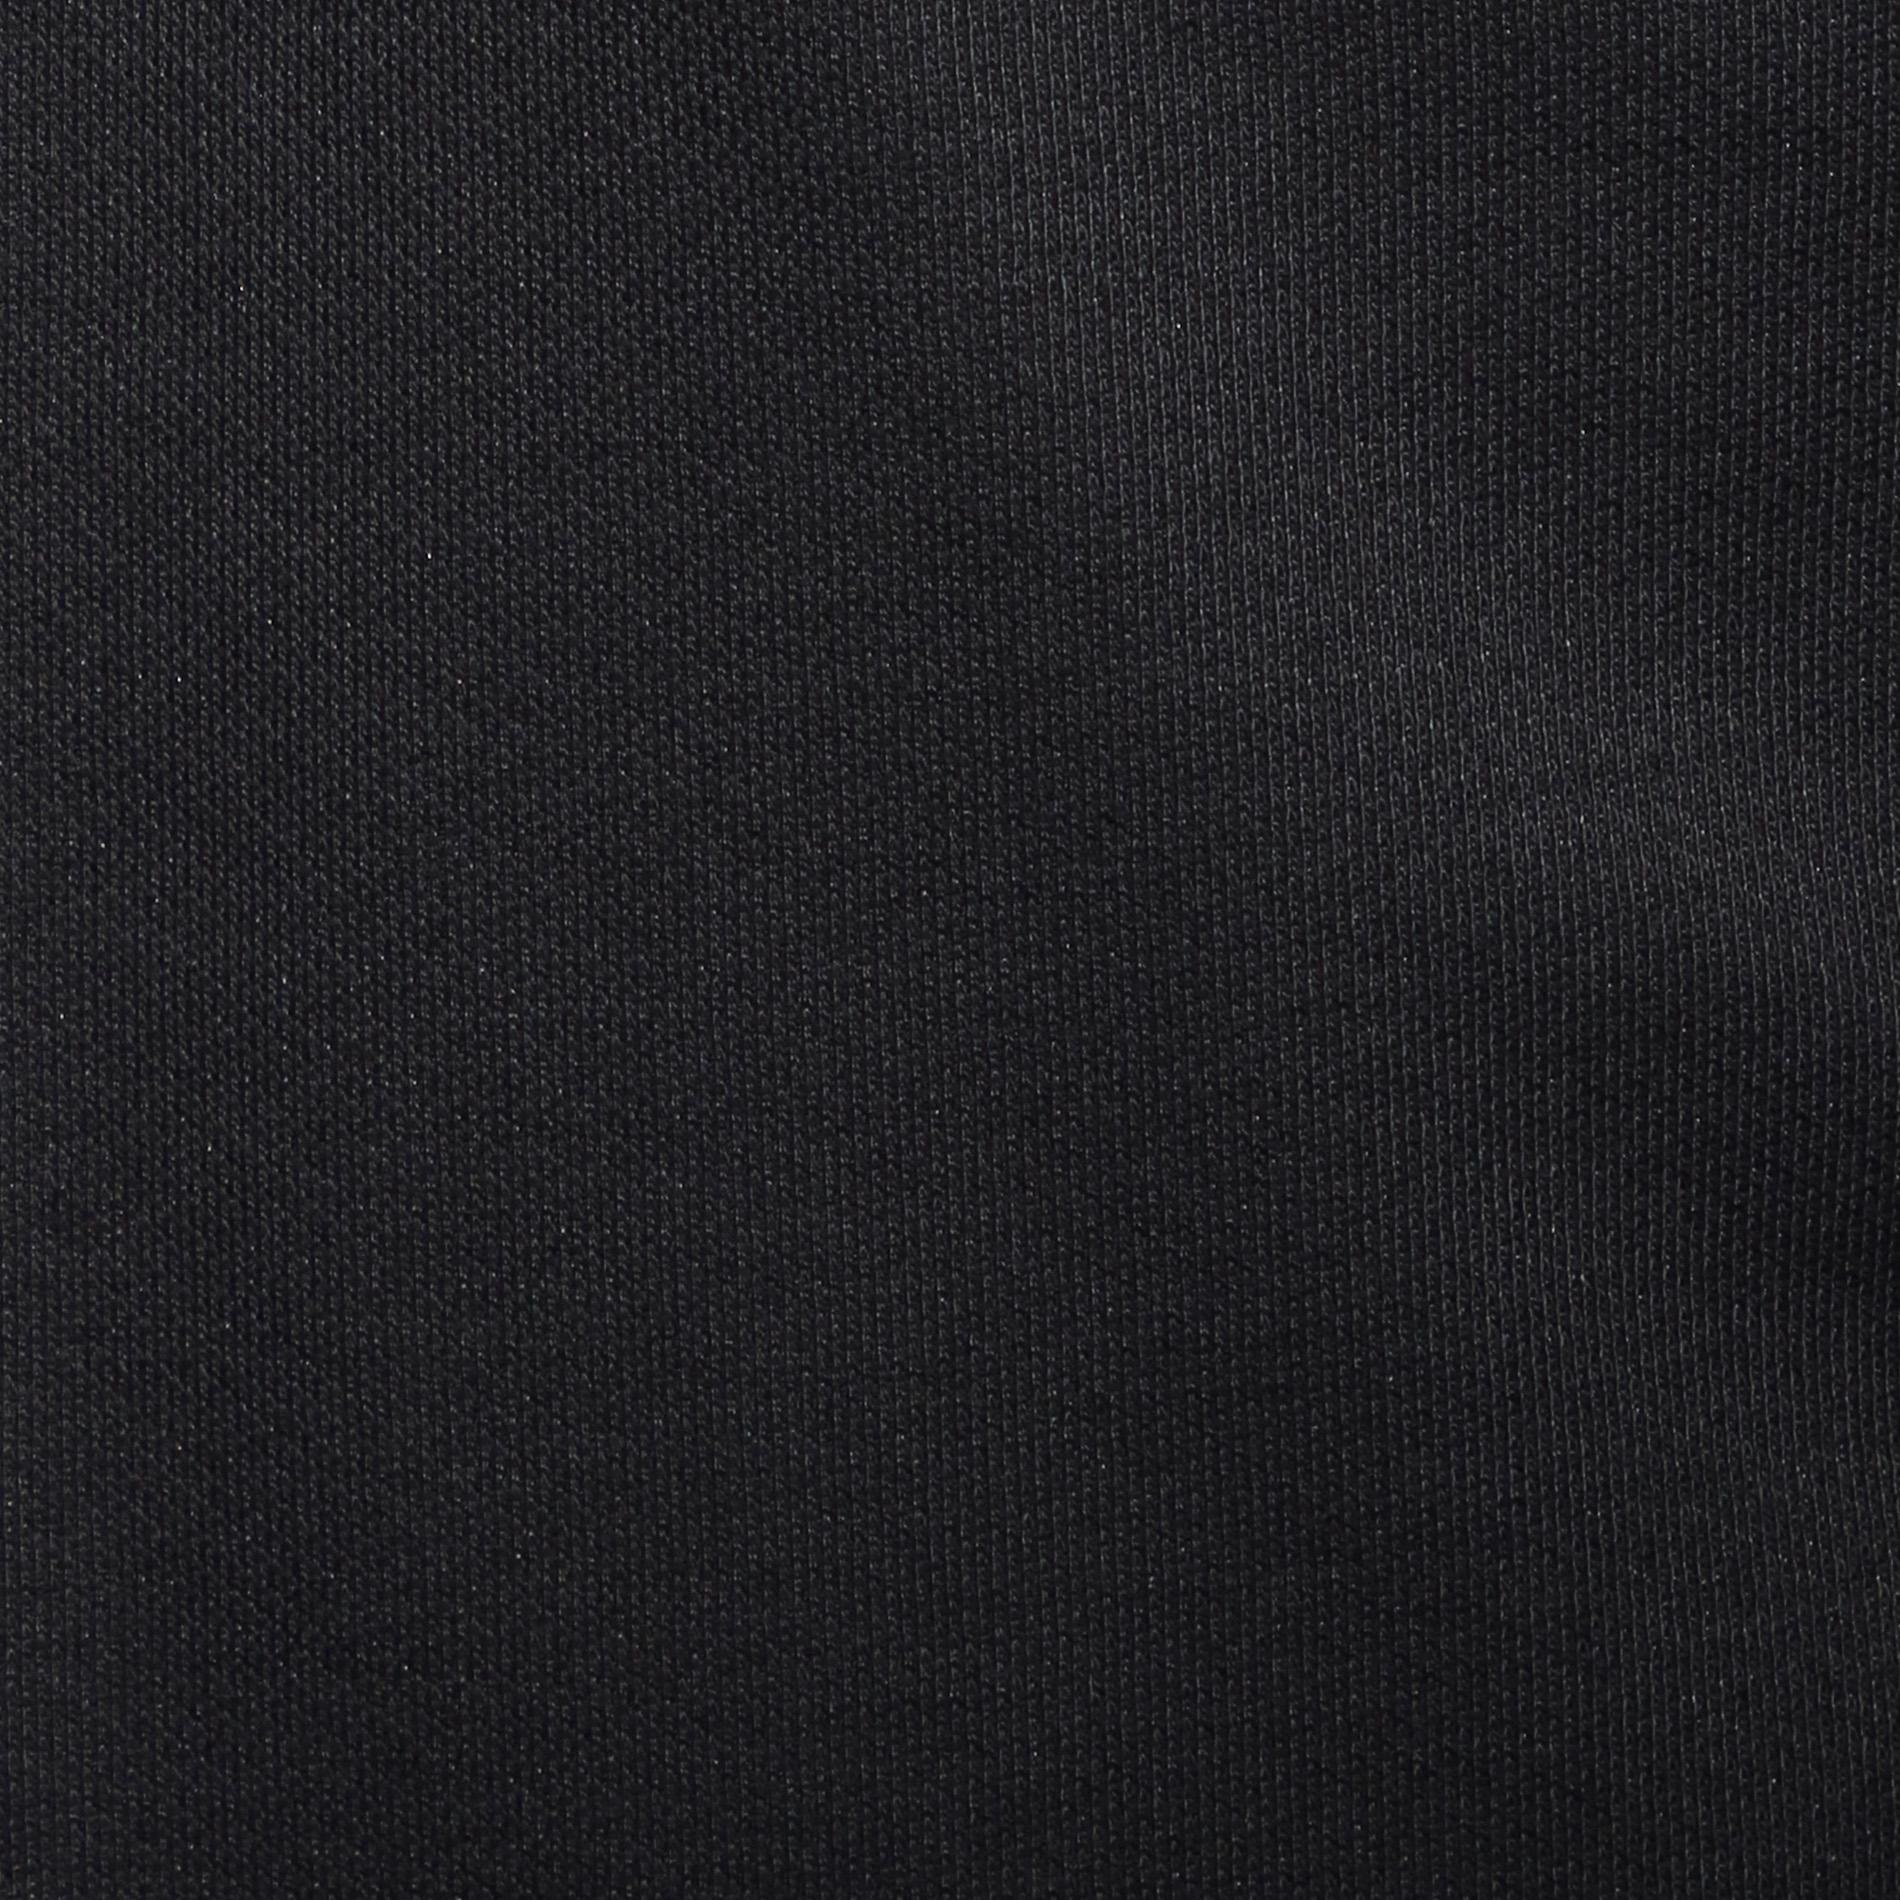 【FLEX JERSEY】絹混バランサーパンツ